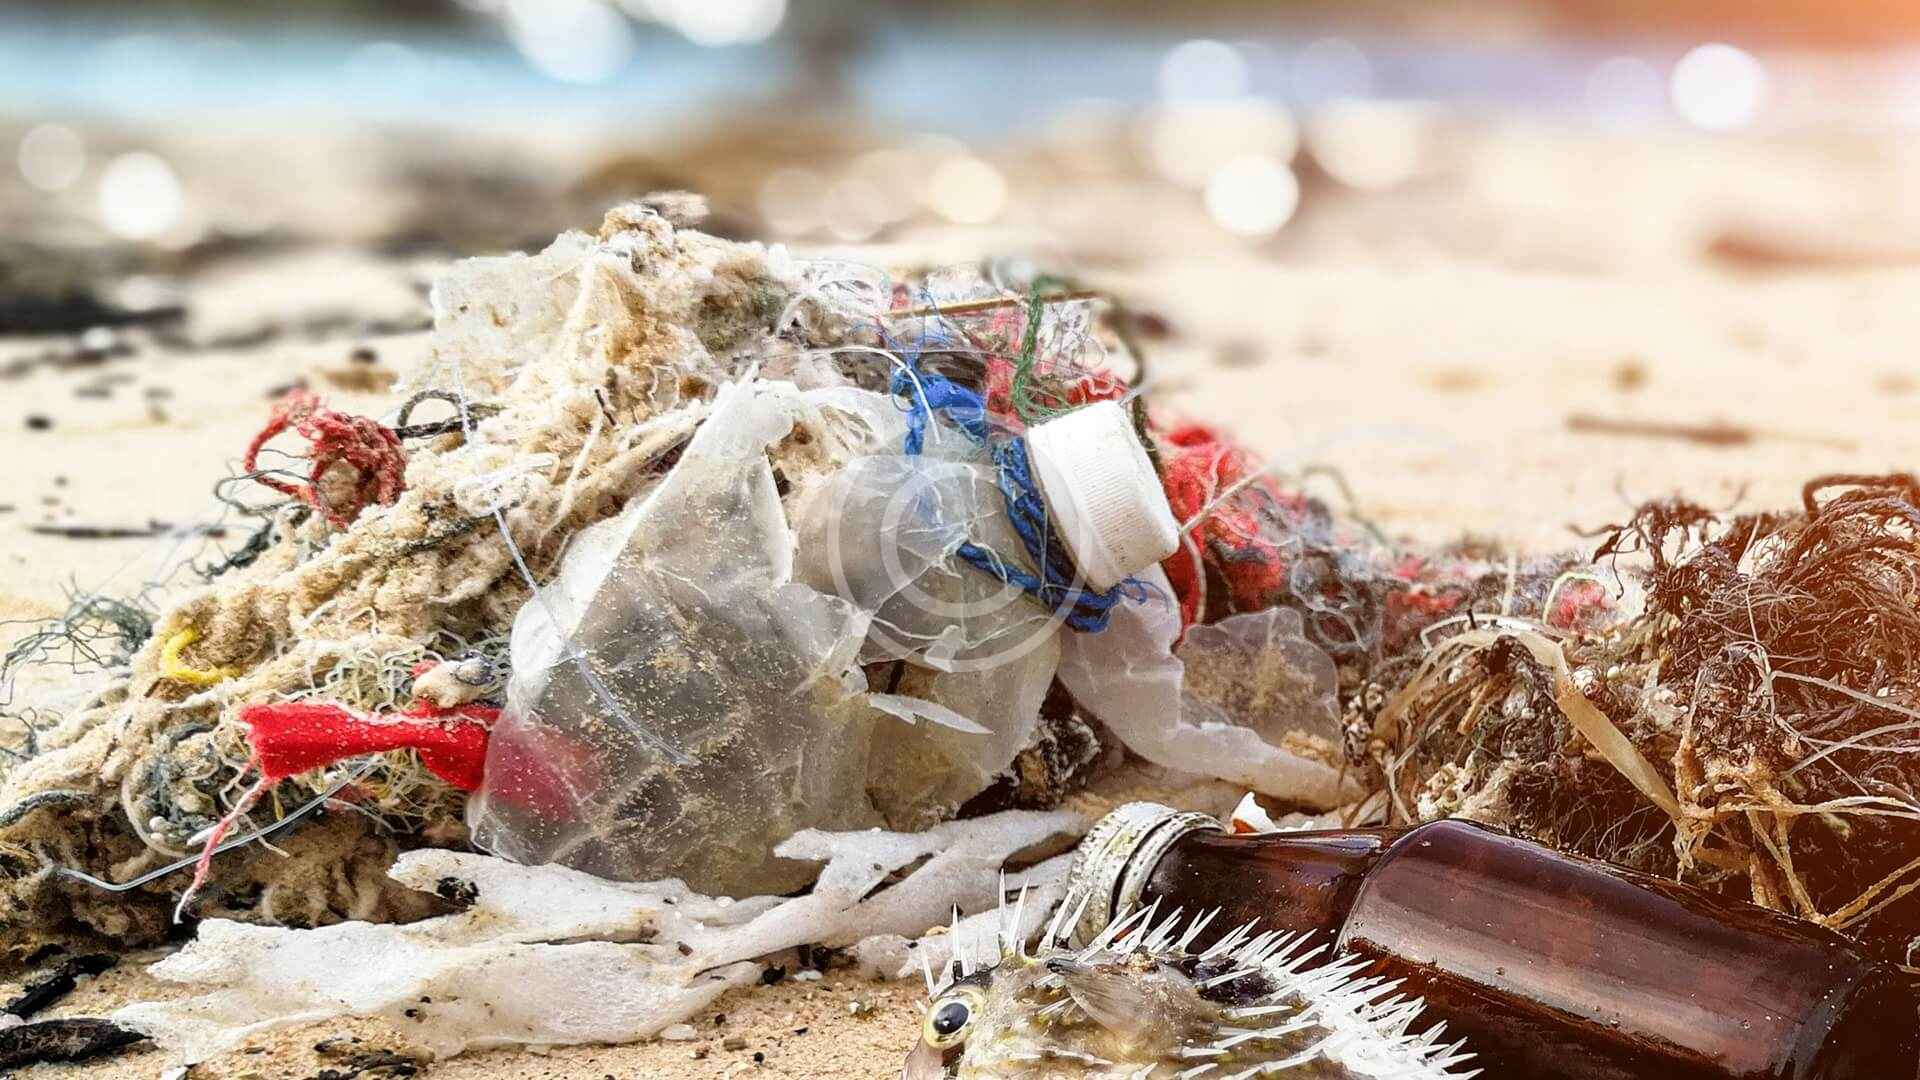 Plastic-Free Beaches, Rivers & Lakes